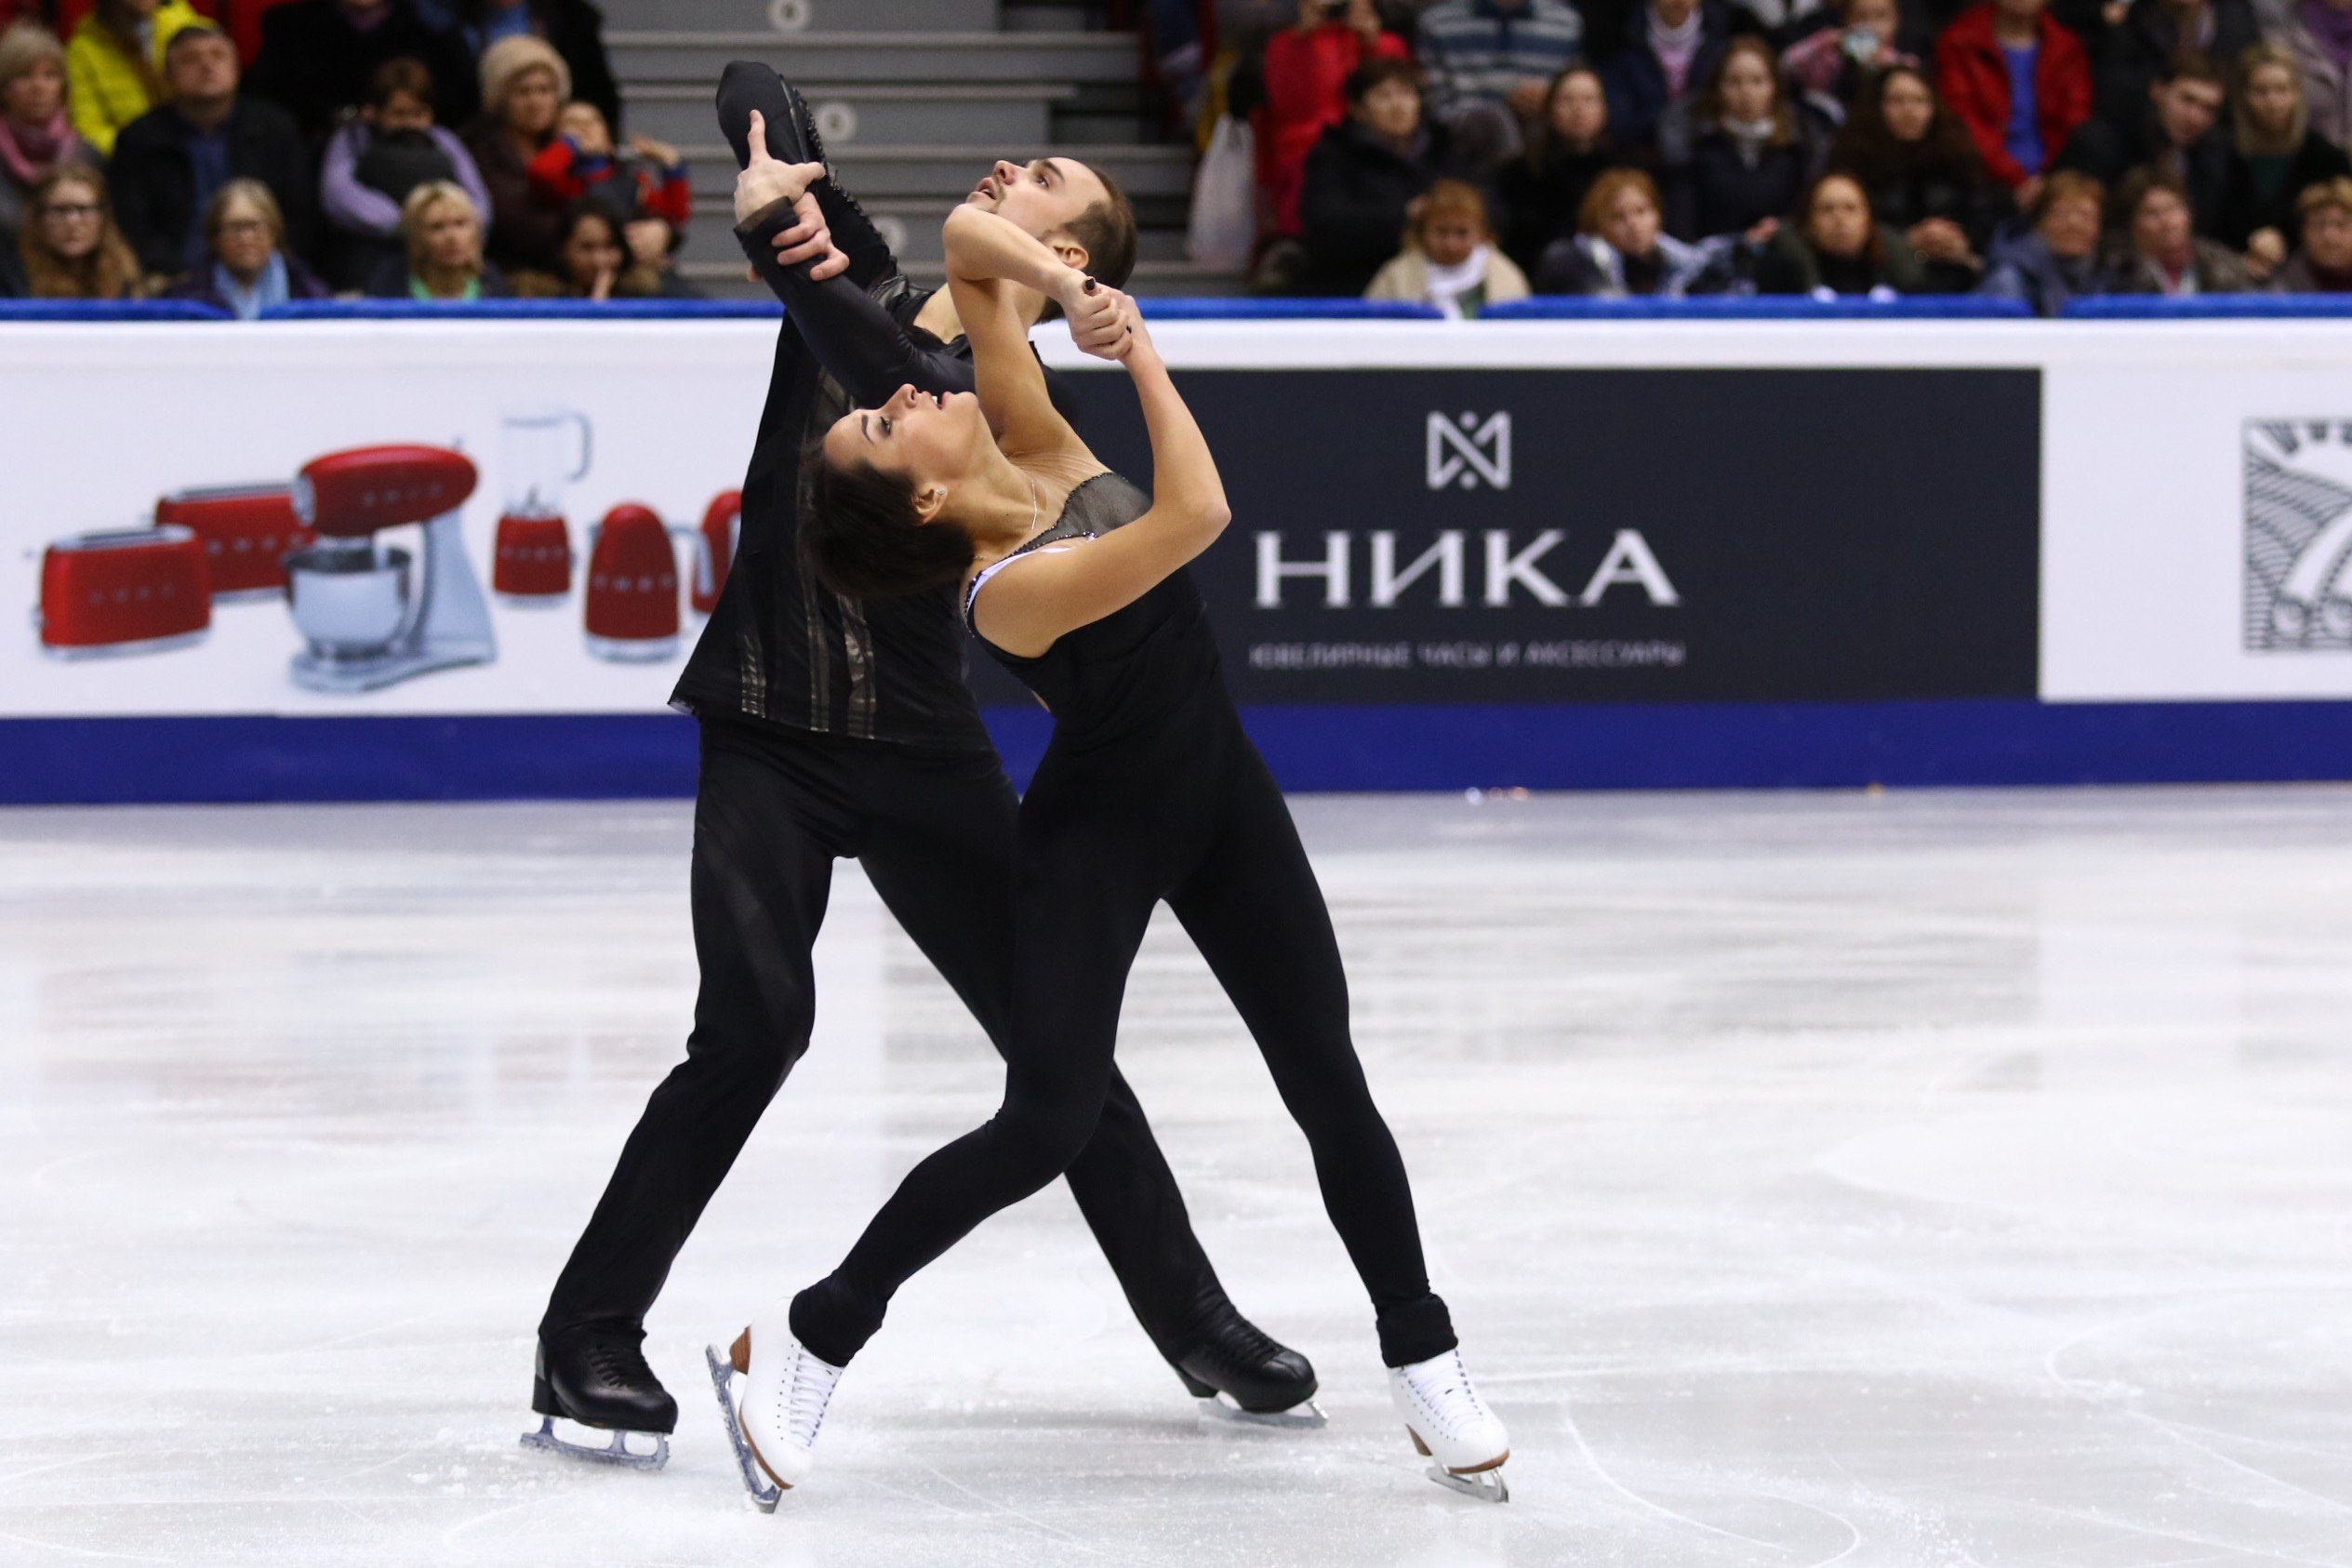 Победите в парном катании - Ксения Столбова и Федор Климов (26.12.2016)